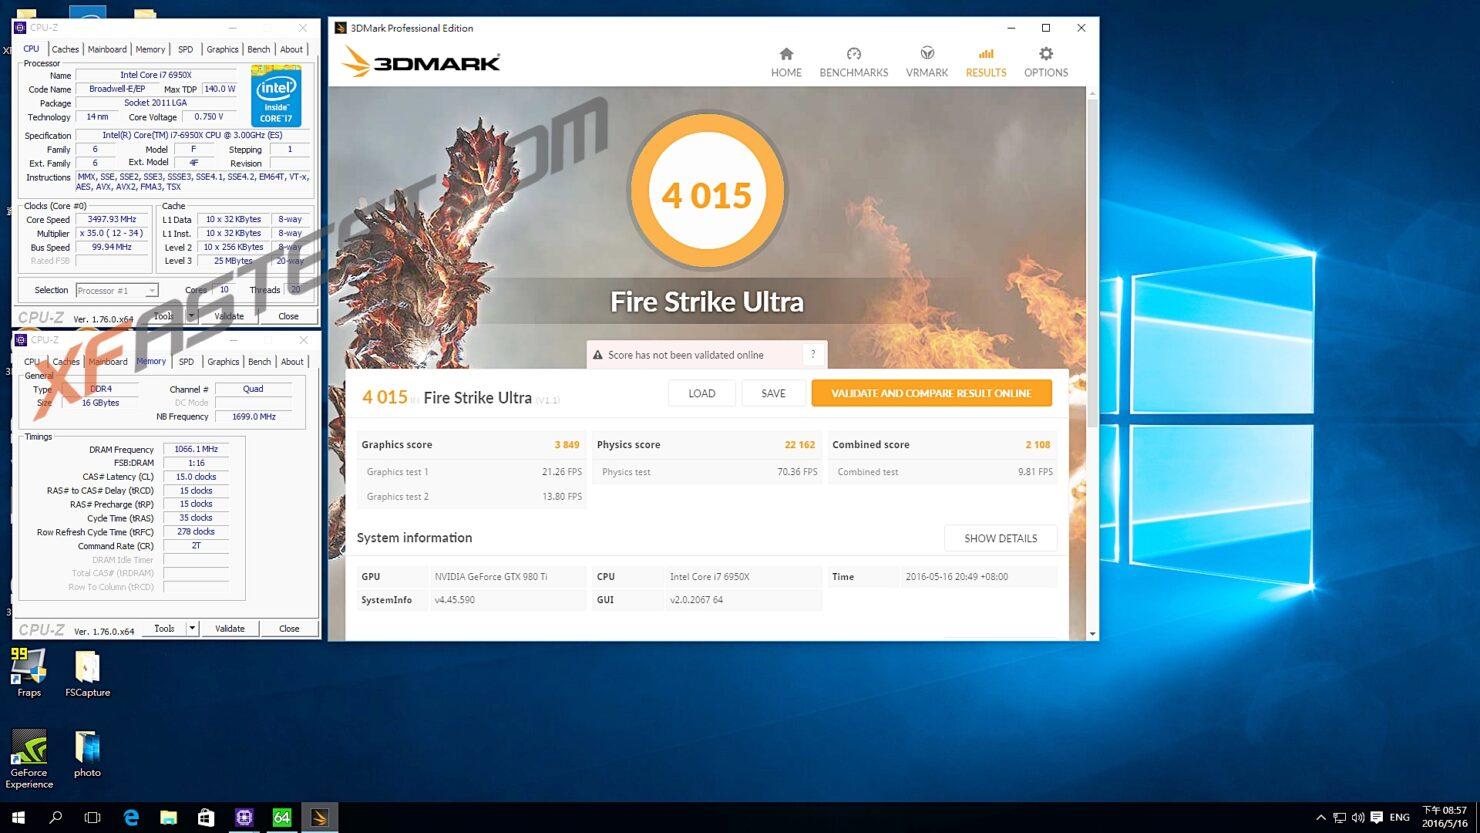 intel-core-i7-6950x_benchmark_3dmark-firestrike-ultra